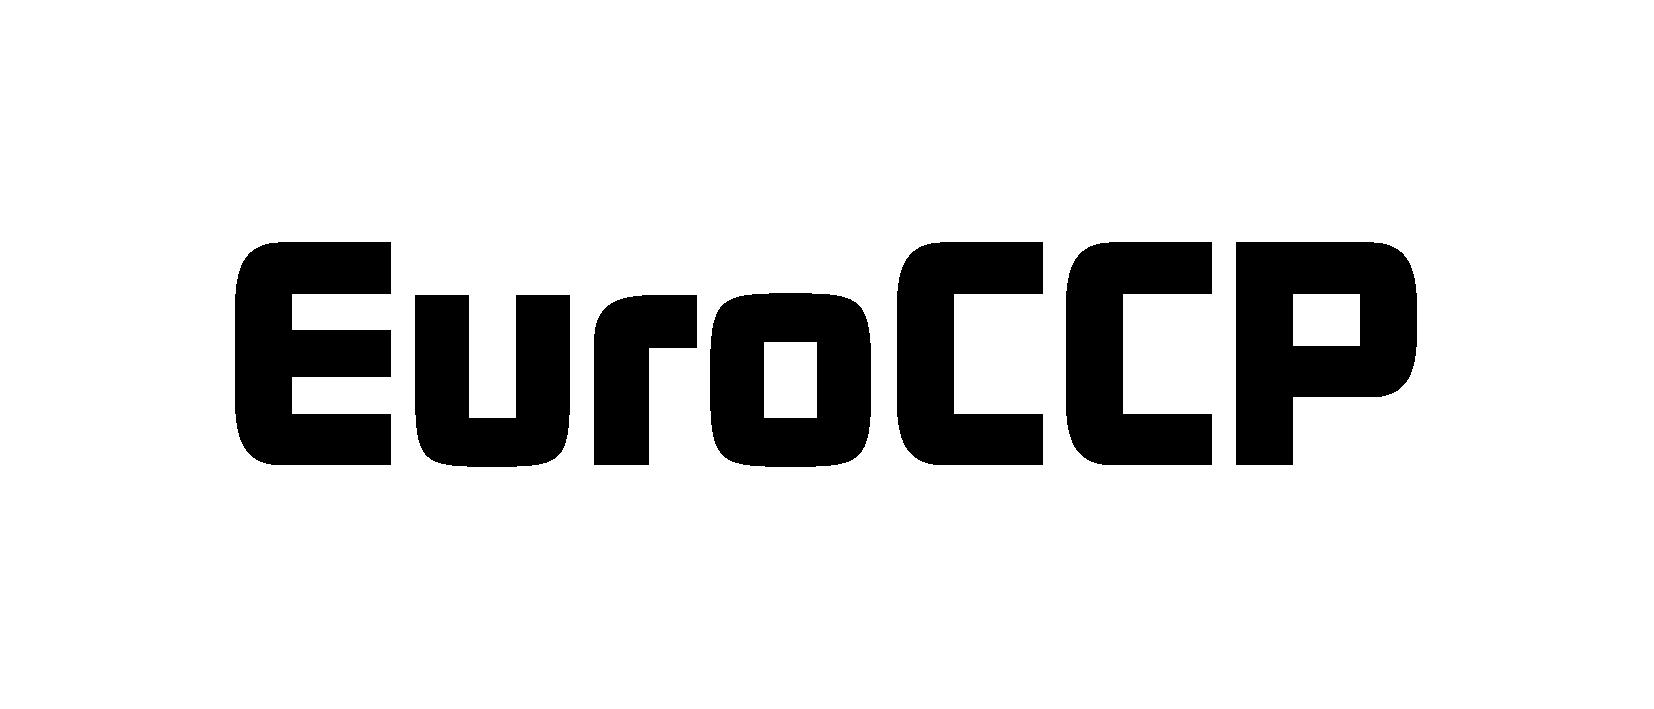 EuroCCP_logo_100mm_pos-01 copy.png